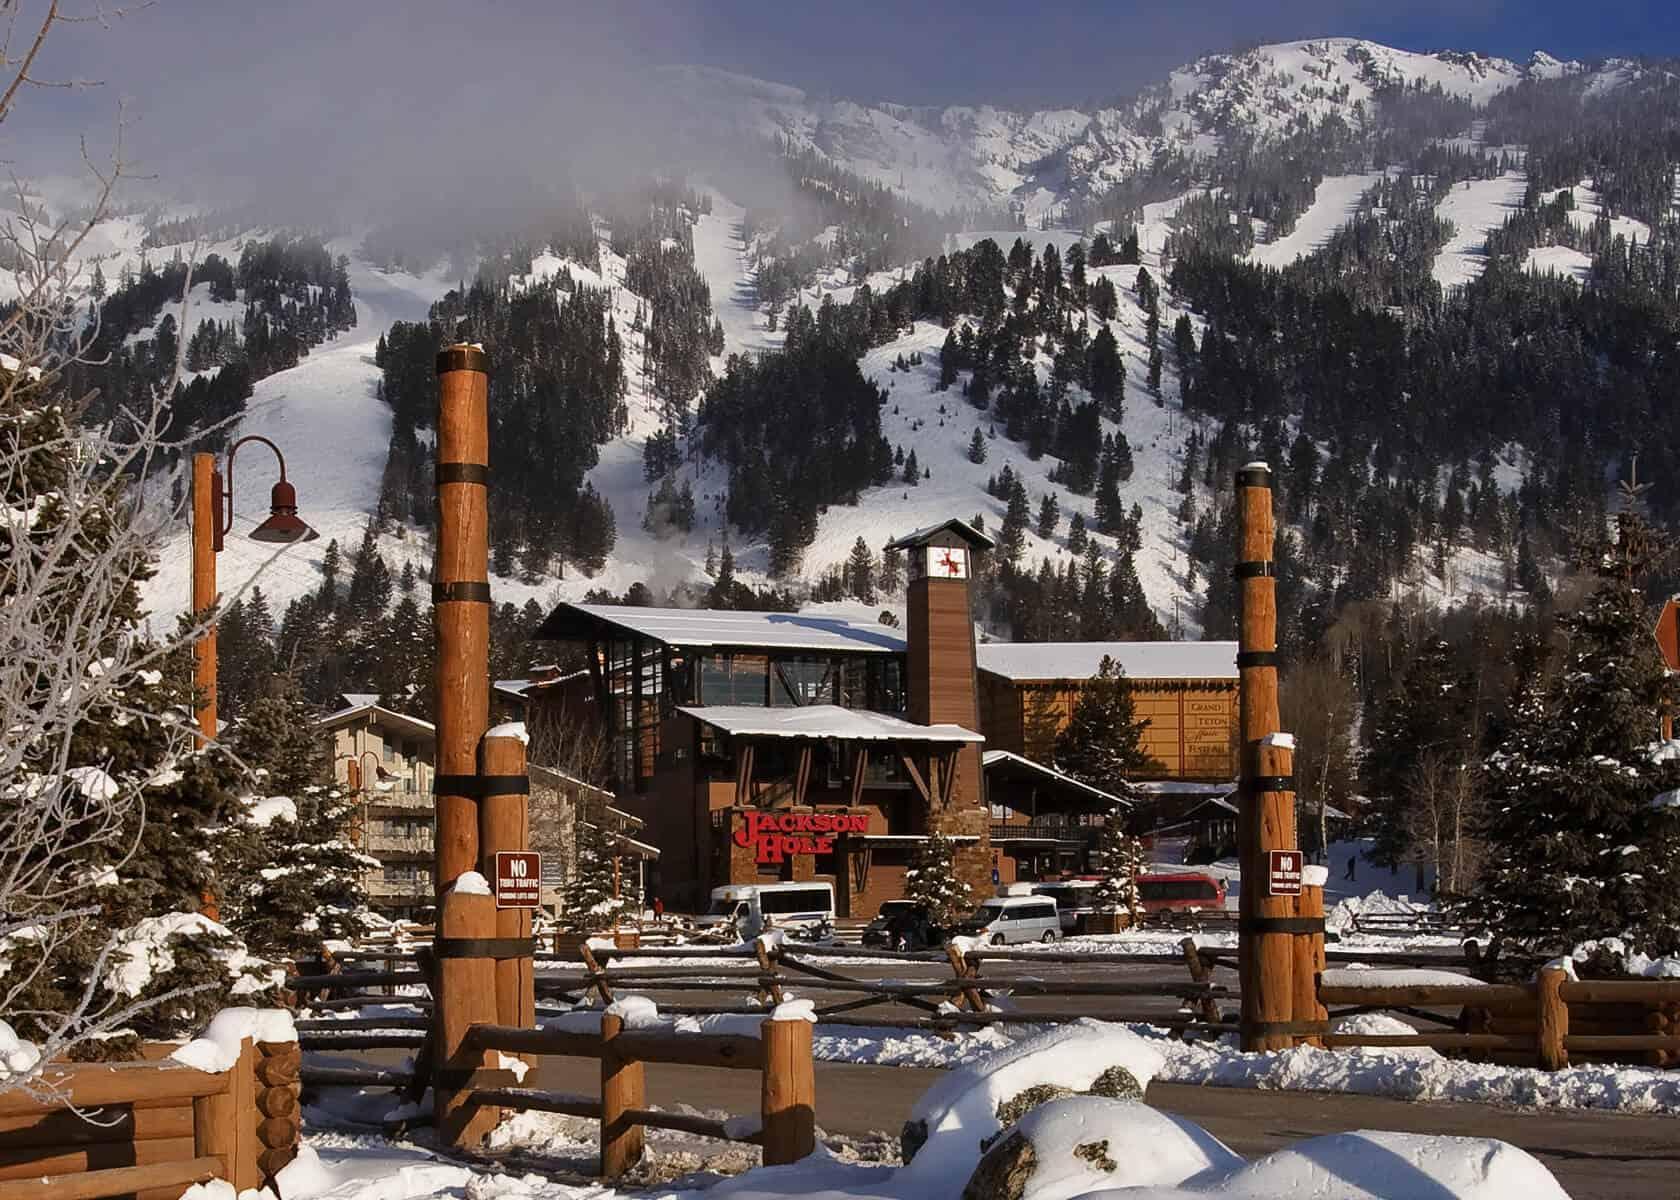 Teton Village in winter, ranked #1 by Ski Magazine